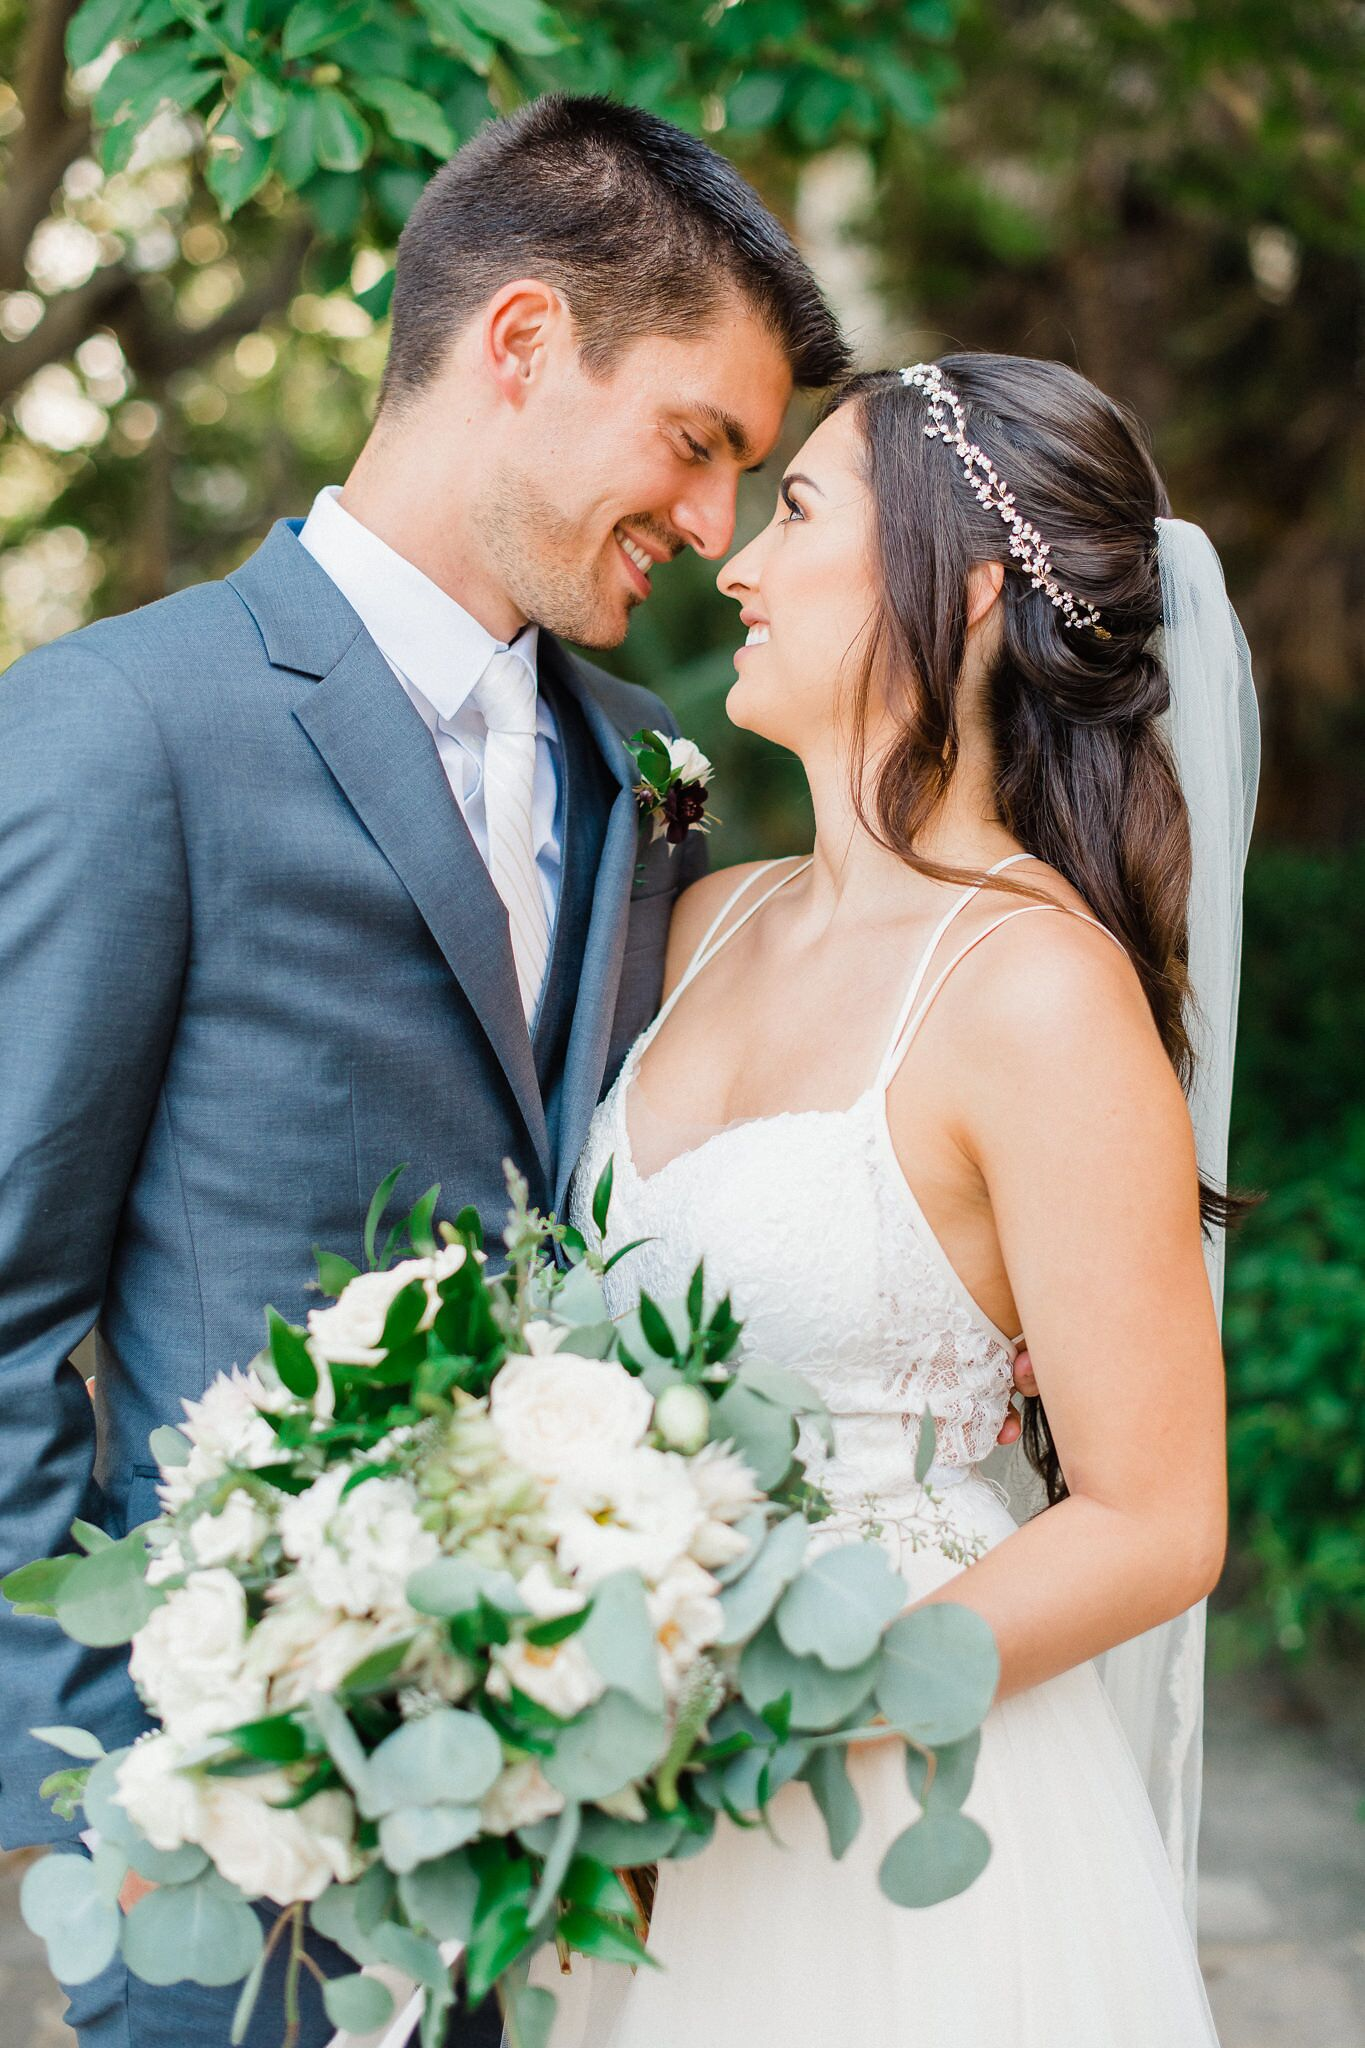 www.santabarbaraweddings.com | Photographer: Grace Kathryn | Venues: Villa & Vine, Santa Barbara Courthouse, Hilton Santa Barbara Resort | Coordination: Burlap & Bordeaux | Bride and Groom